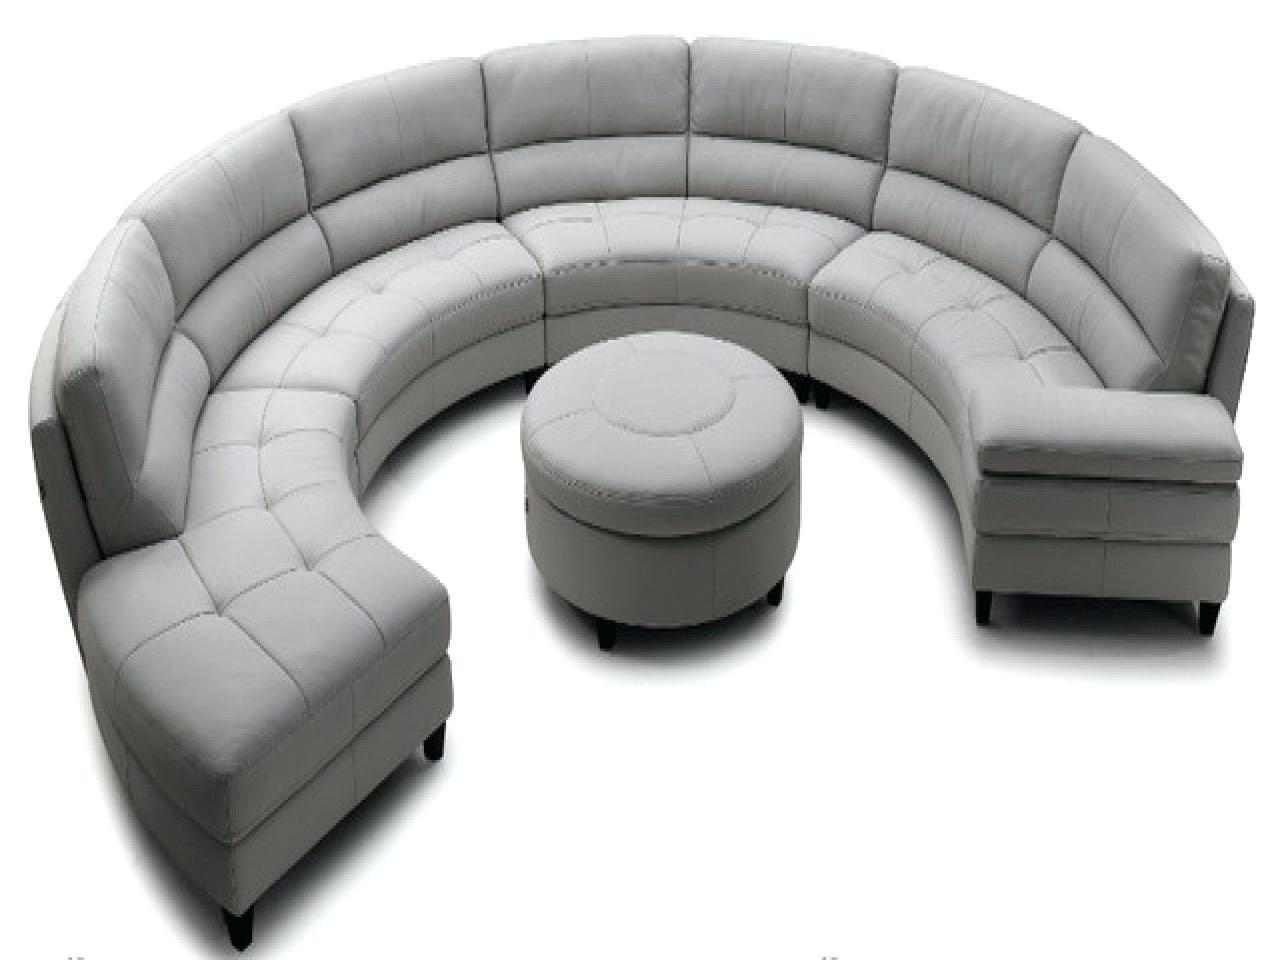 Popular Circular Sectional Sofa Sa Sas Bed Semi Circle Couches Modern With Round Sofas (View 10 of 15)